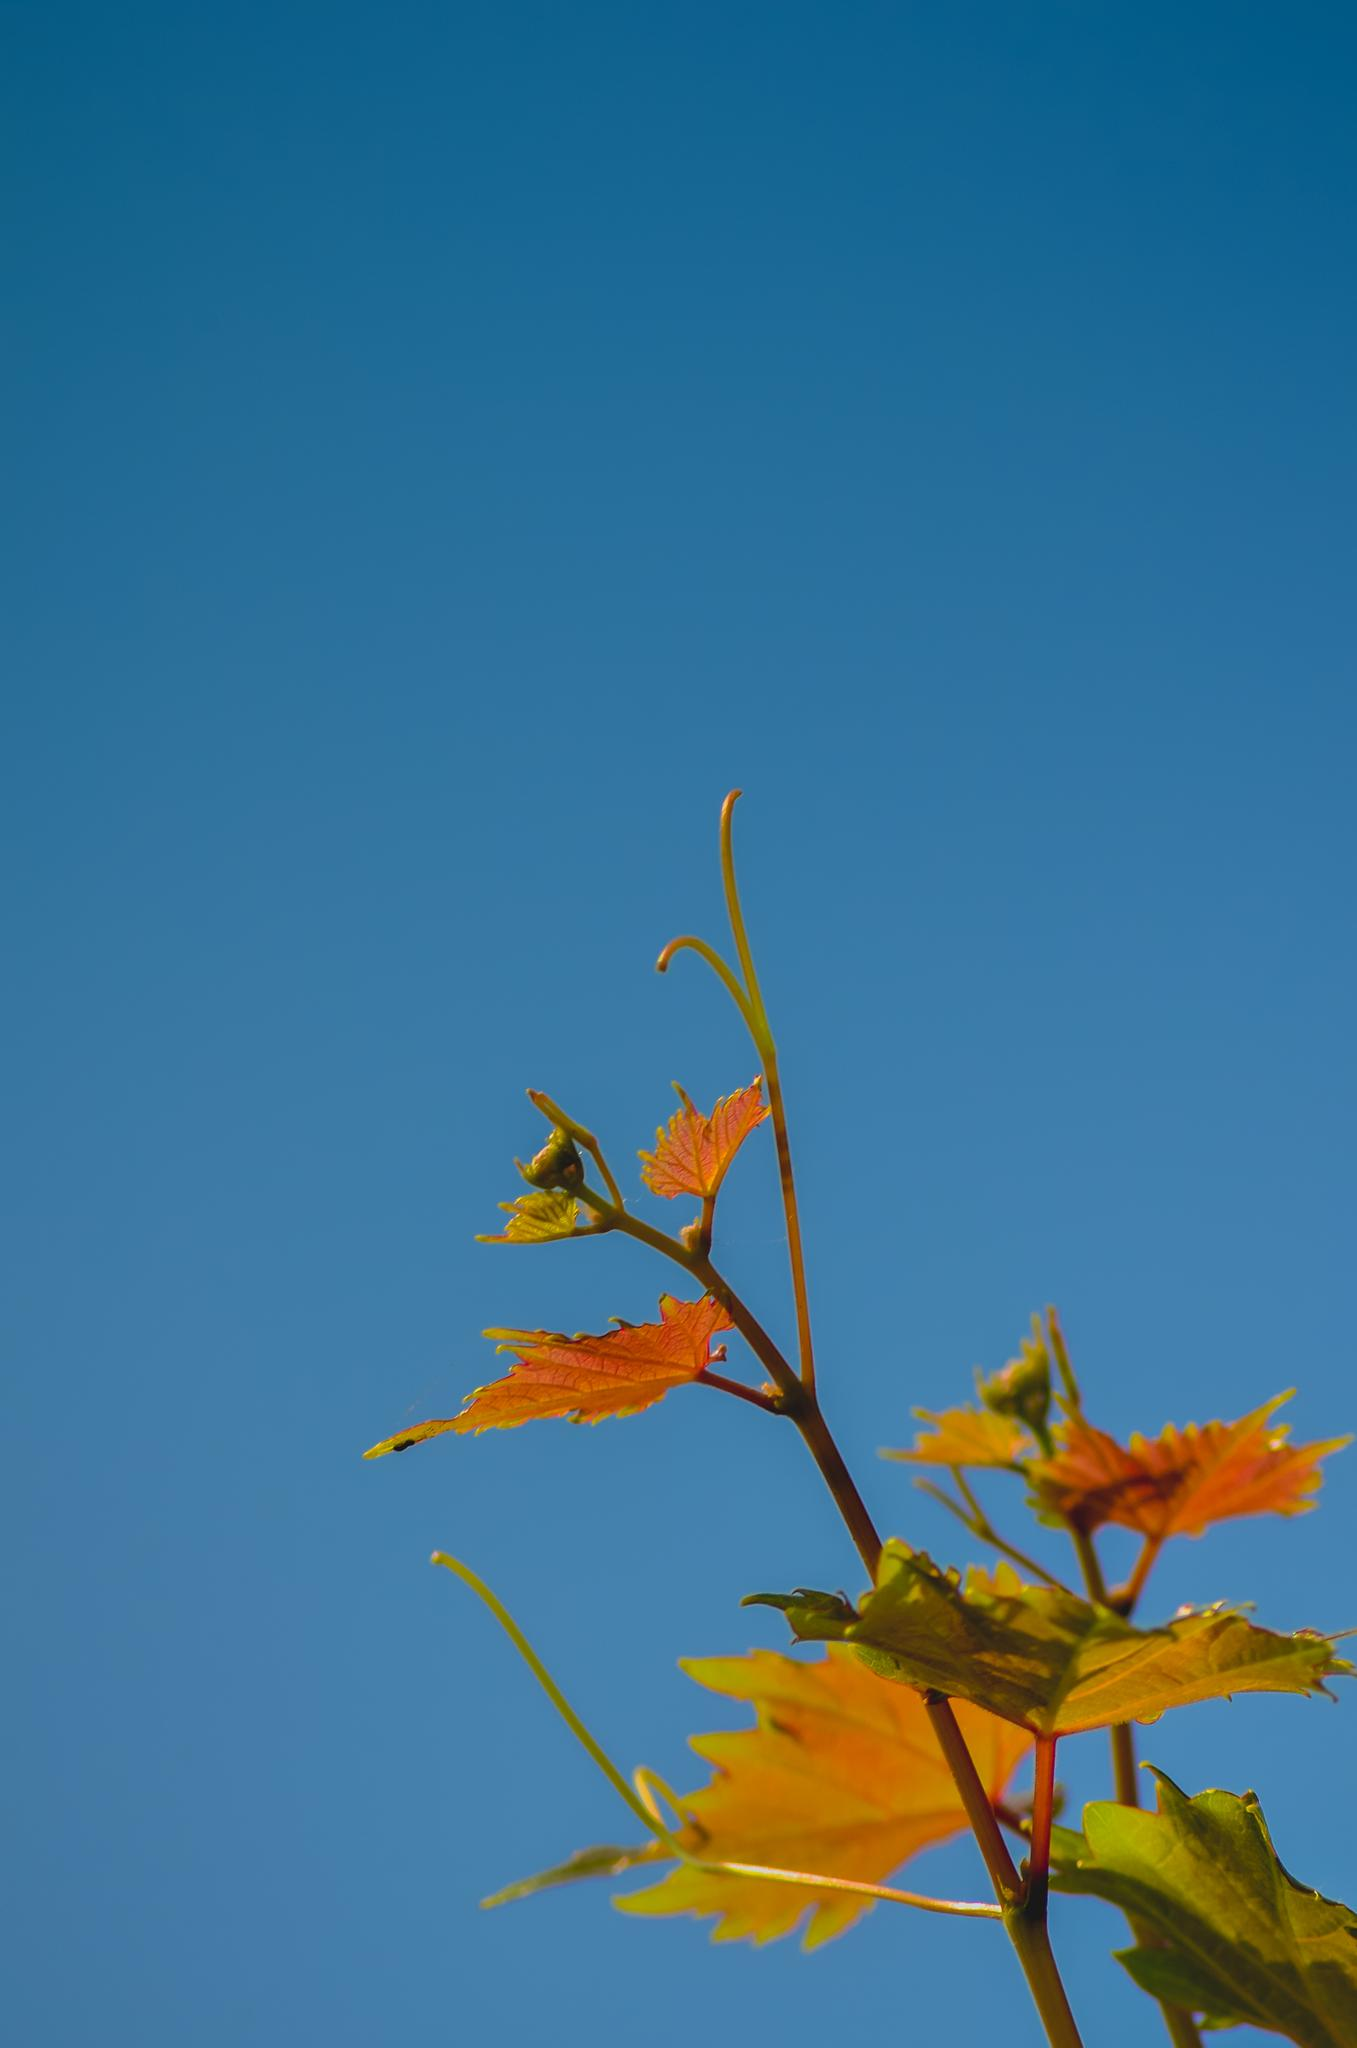 Leaf by eagleeyes1717